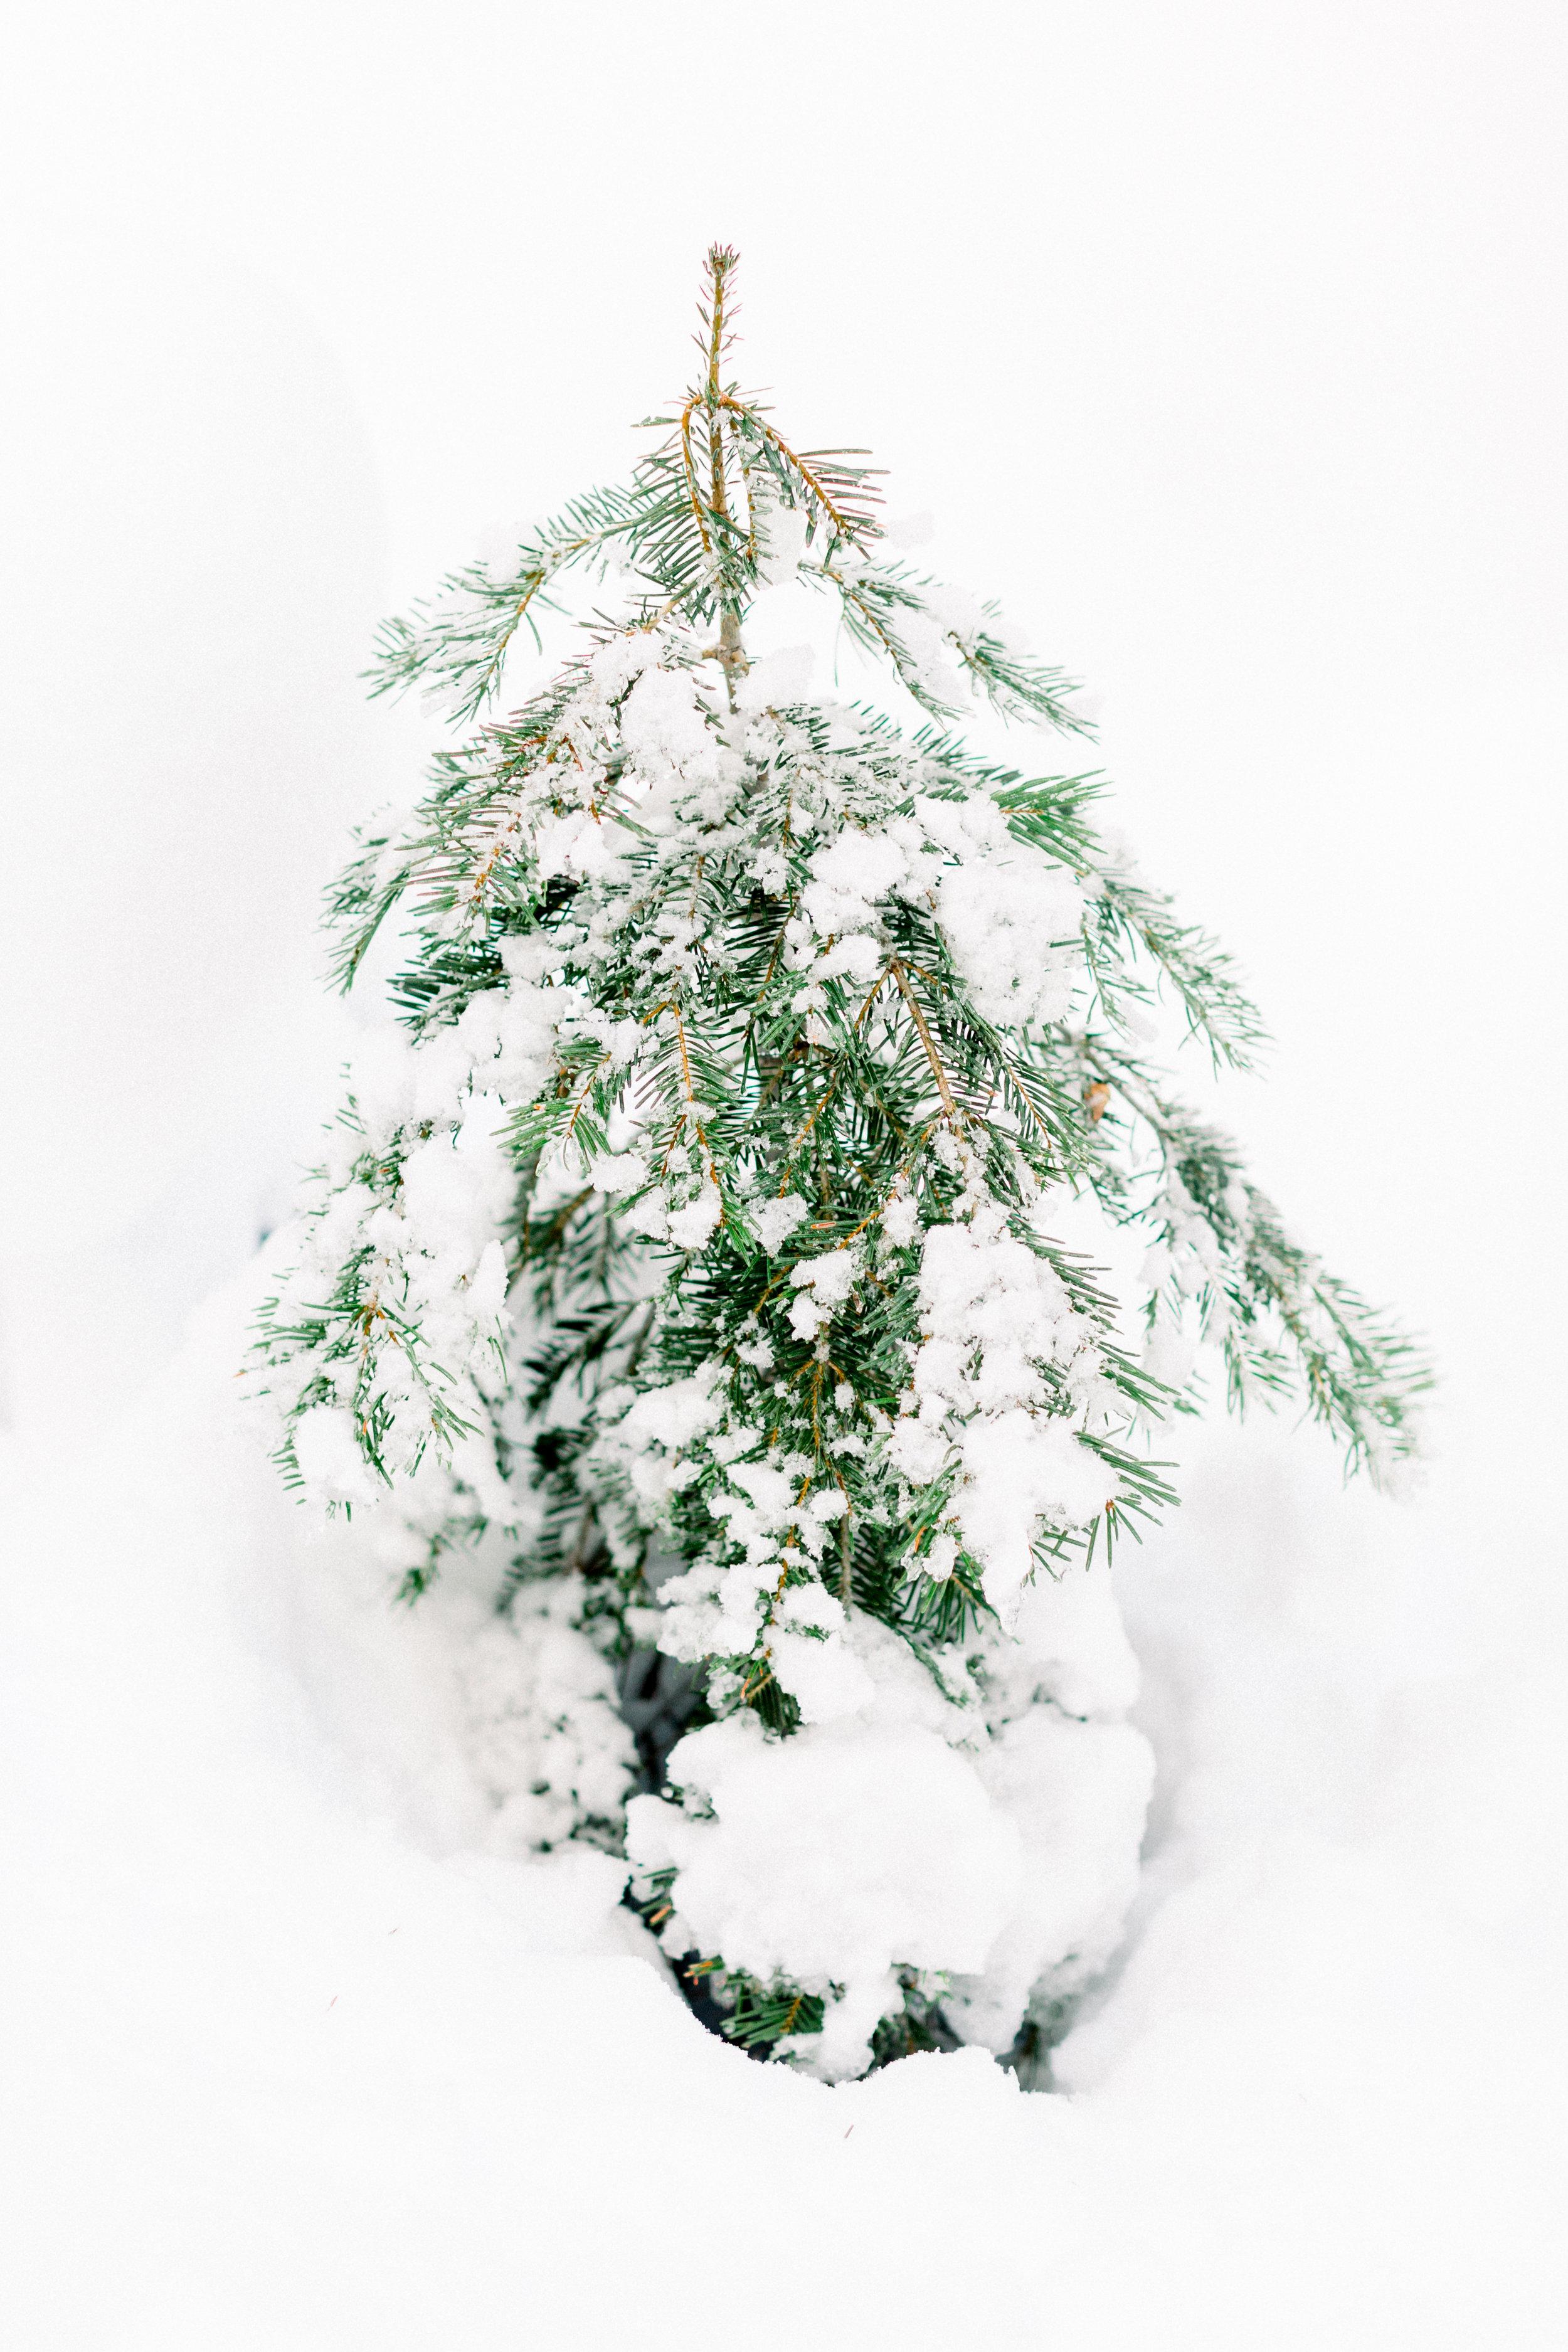 129Butte-Meadows-Christmas-Tree-Adventure (98 of).jpg